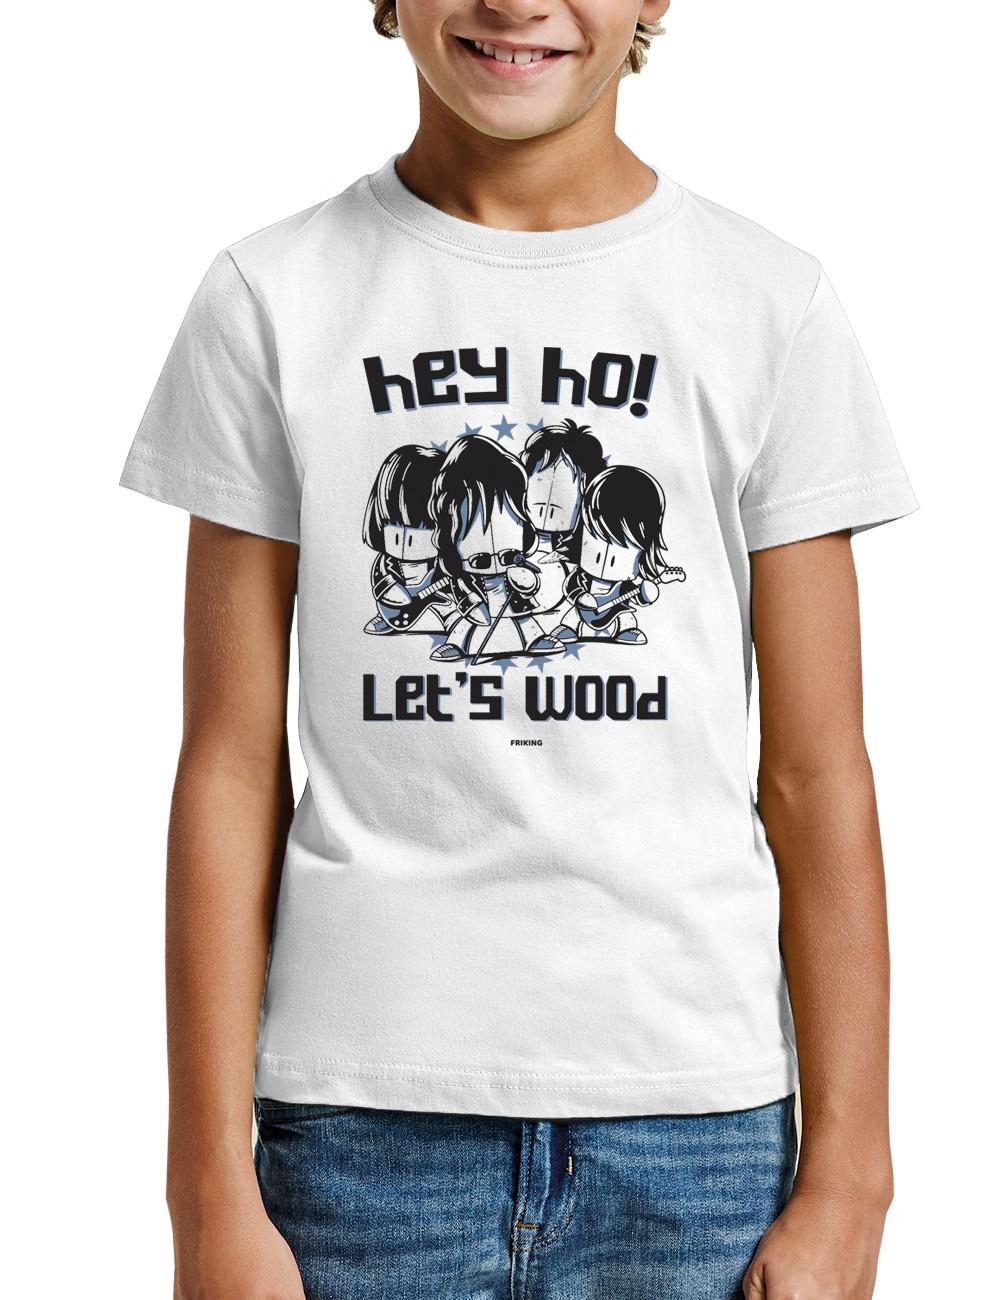 Hey ho! Lets wood